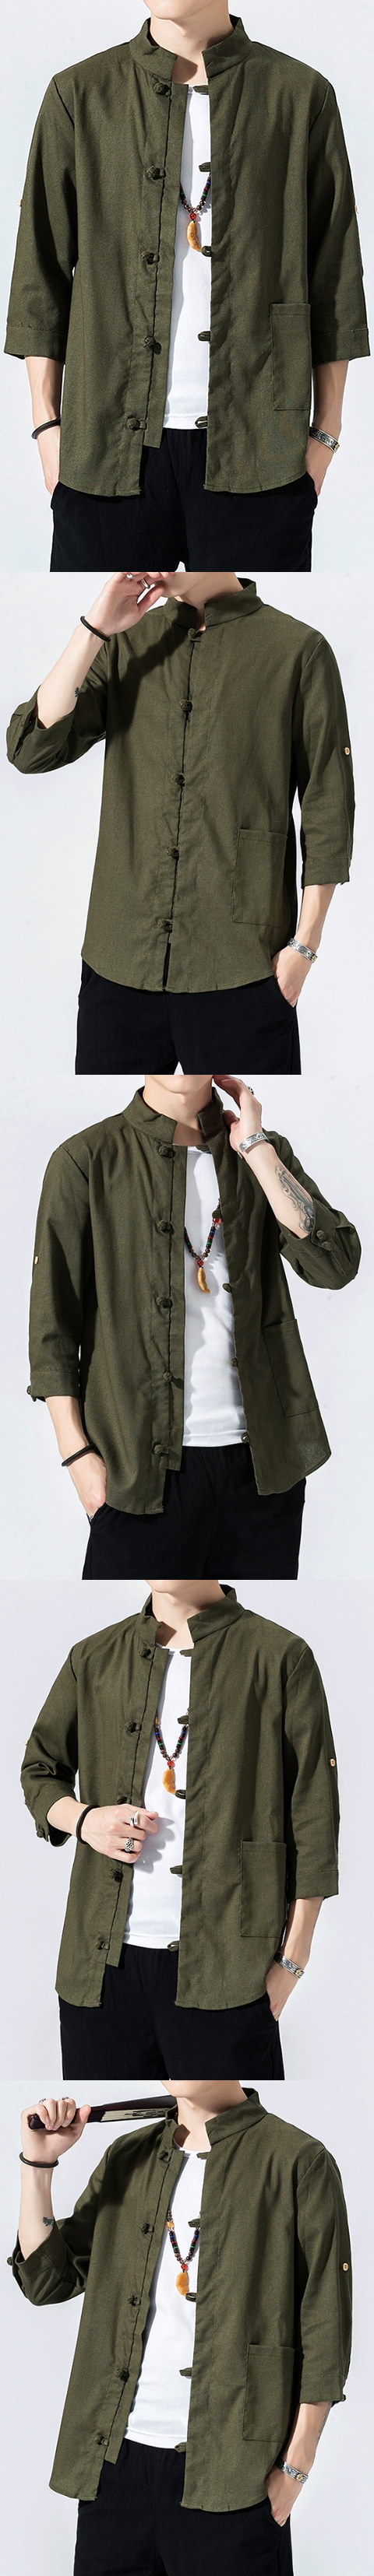 Chic Mandarin 3/4-sleeve Cotton Shirt - Olive (RM)